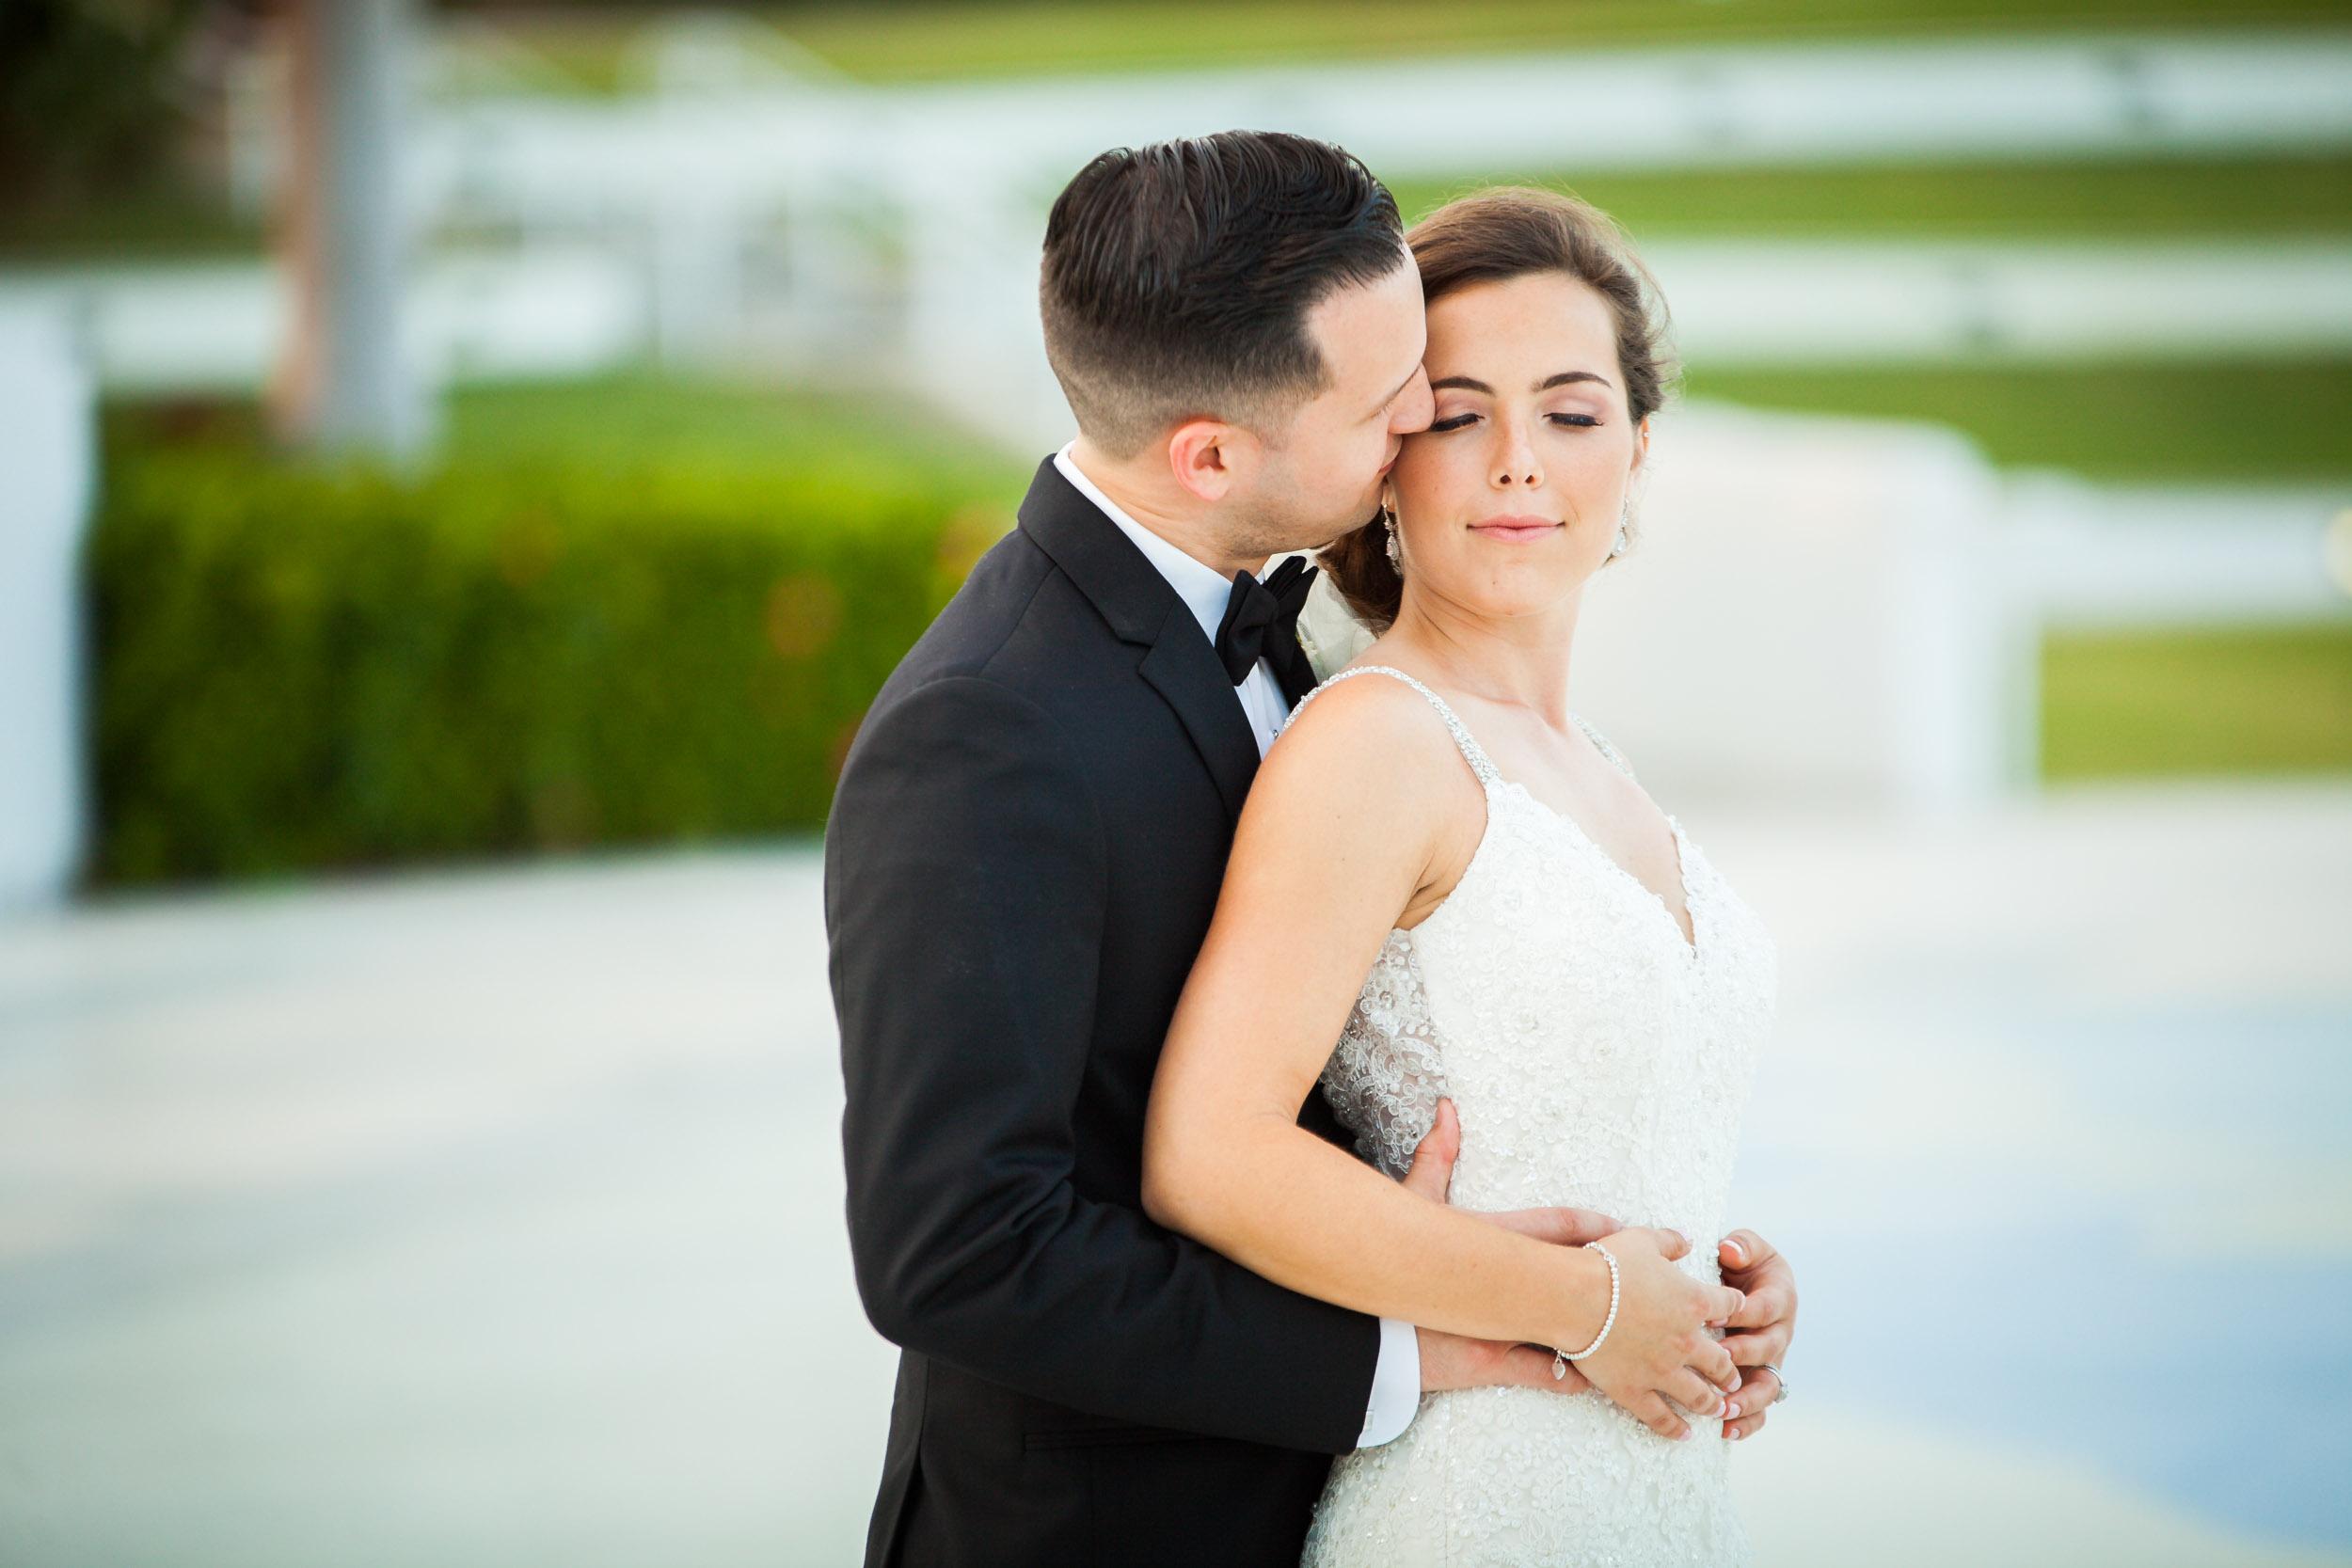 Flordia-Wedding-Photography-46.jpg